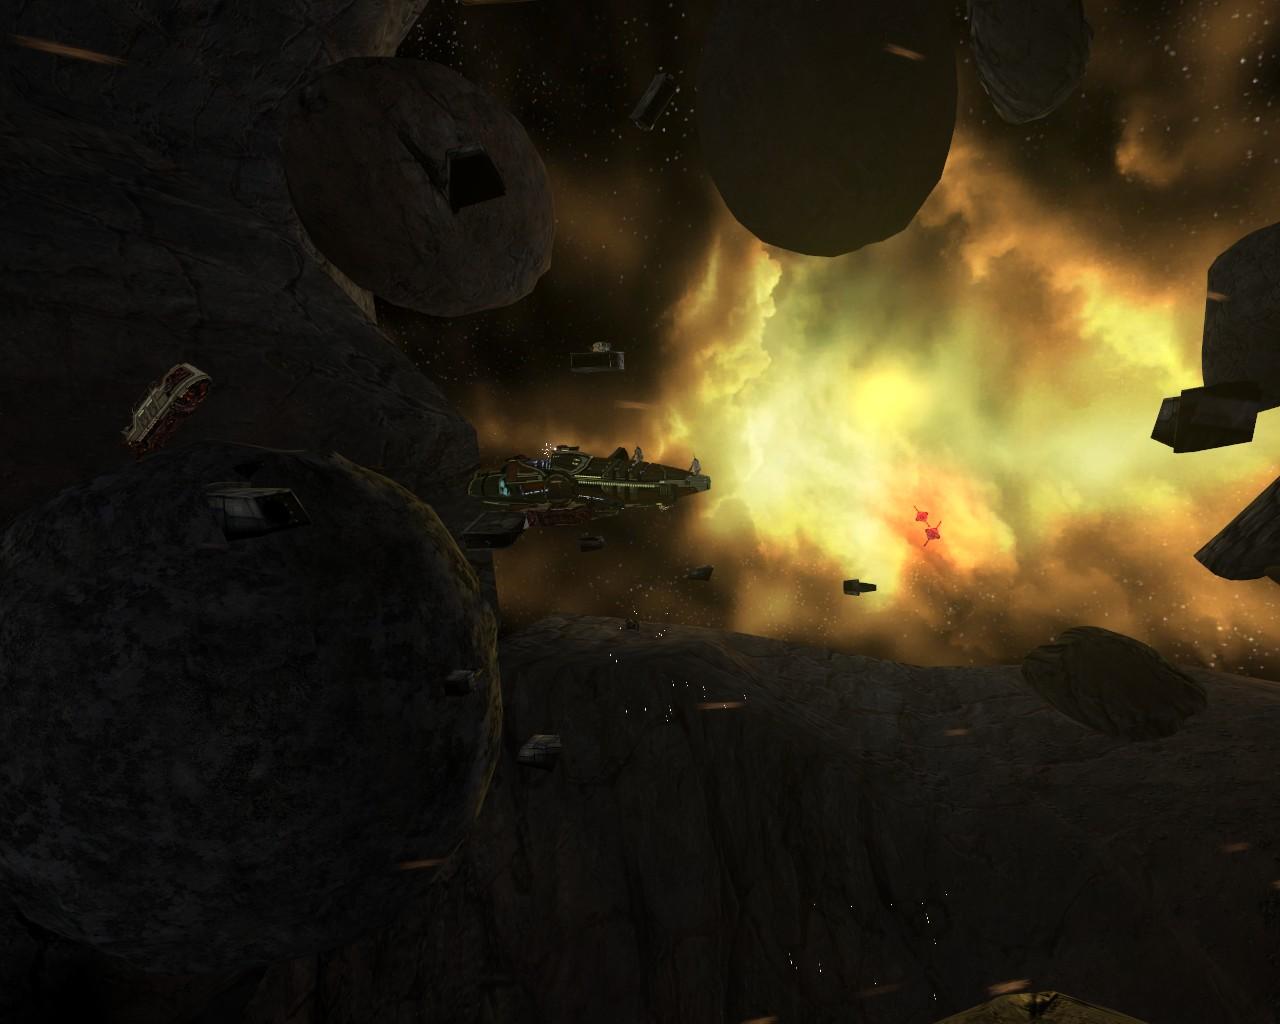 The derelict NTSS Pheonix floats in space.